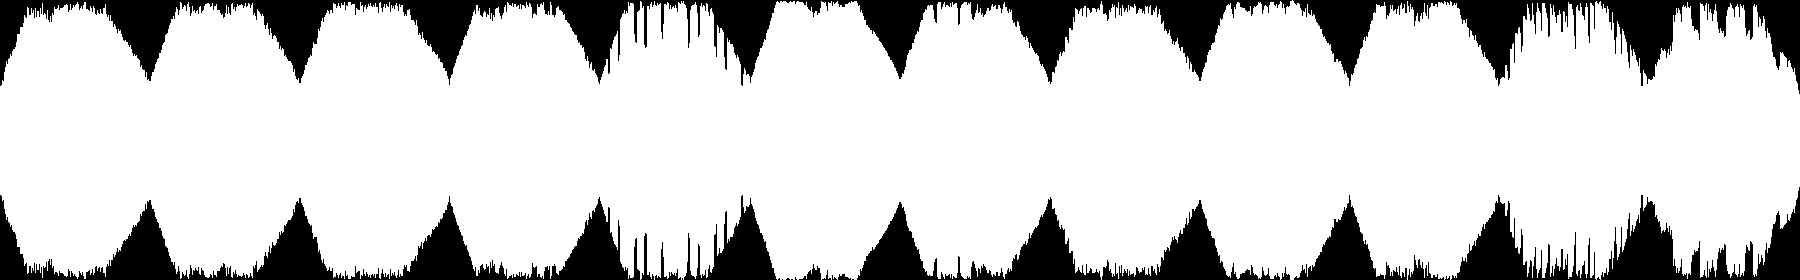 IMMIDIATE - Chillsynth audio waveform